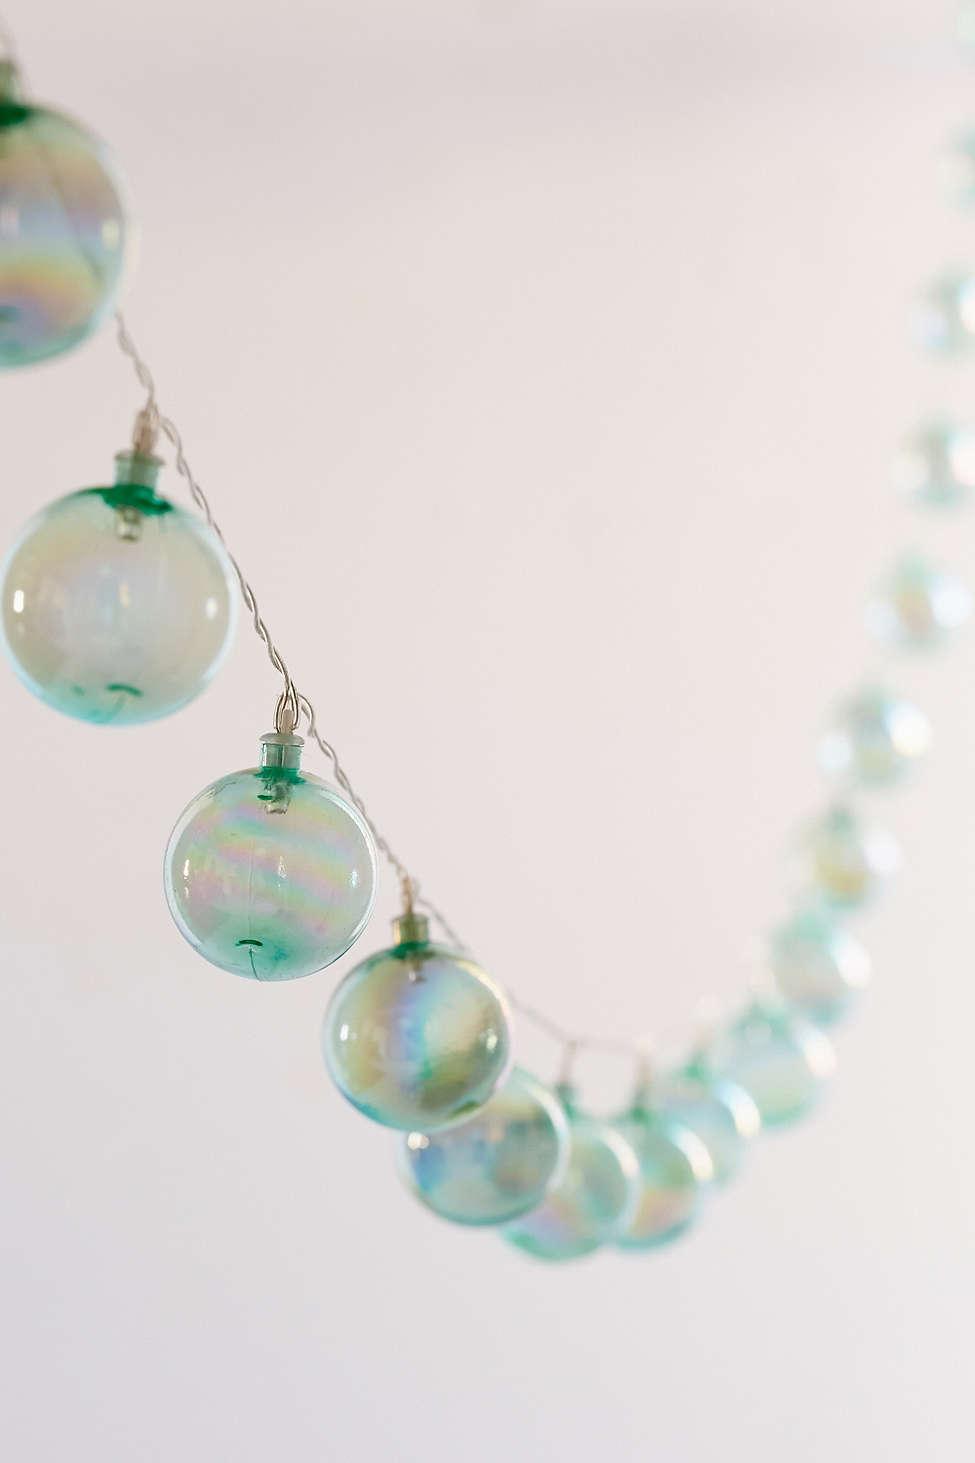 Iridescent Bubble String Lights